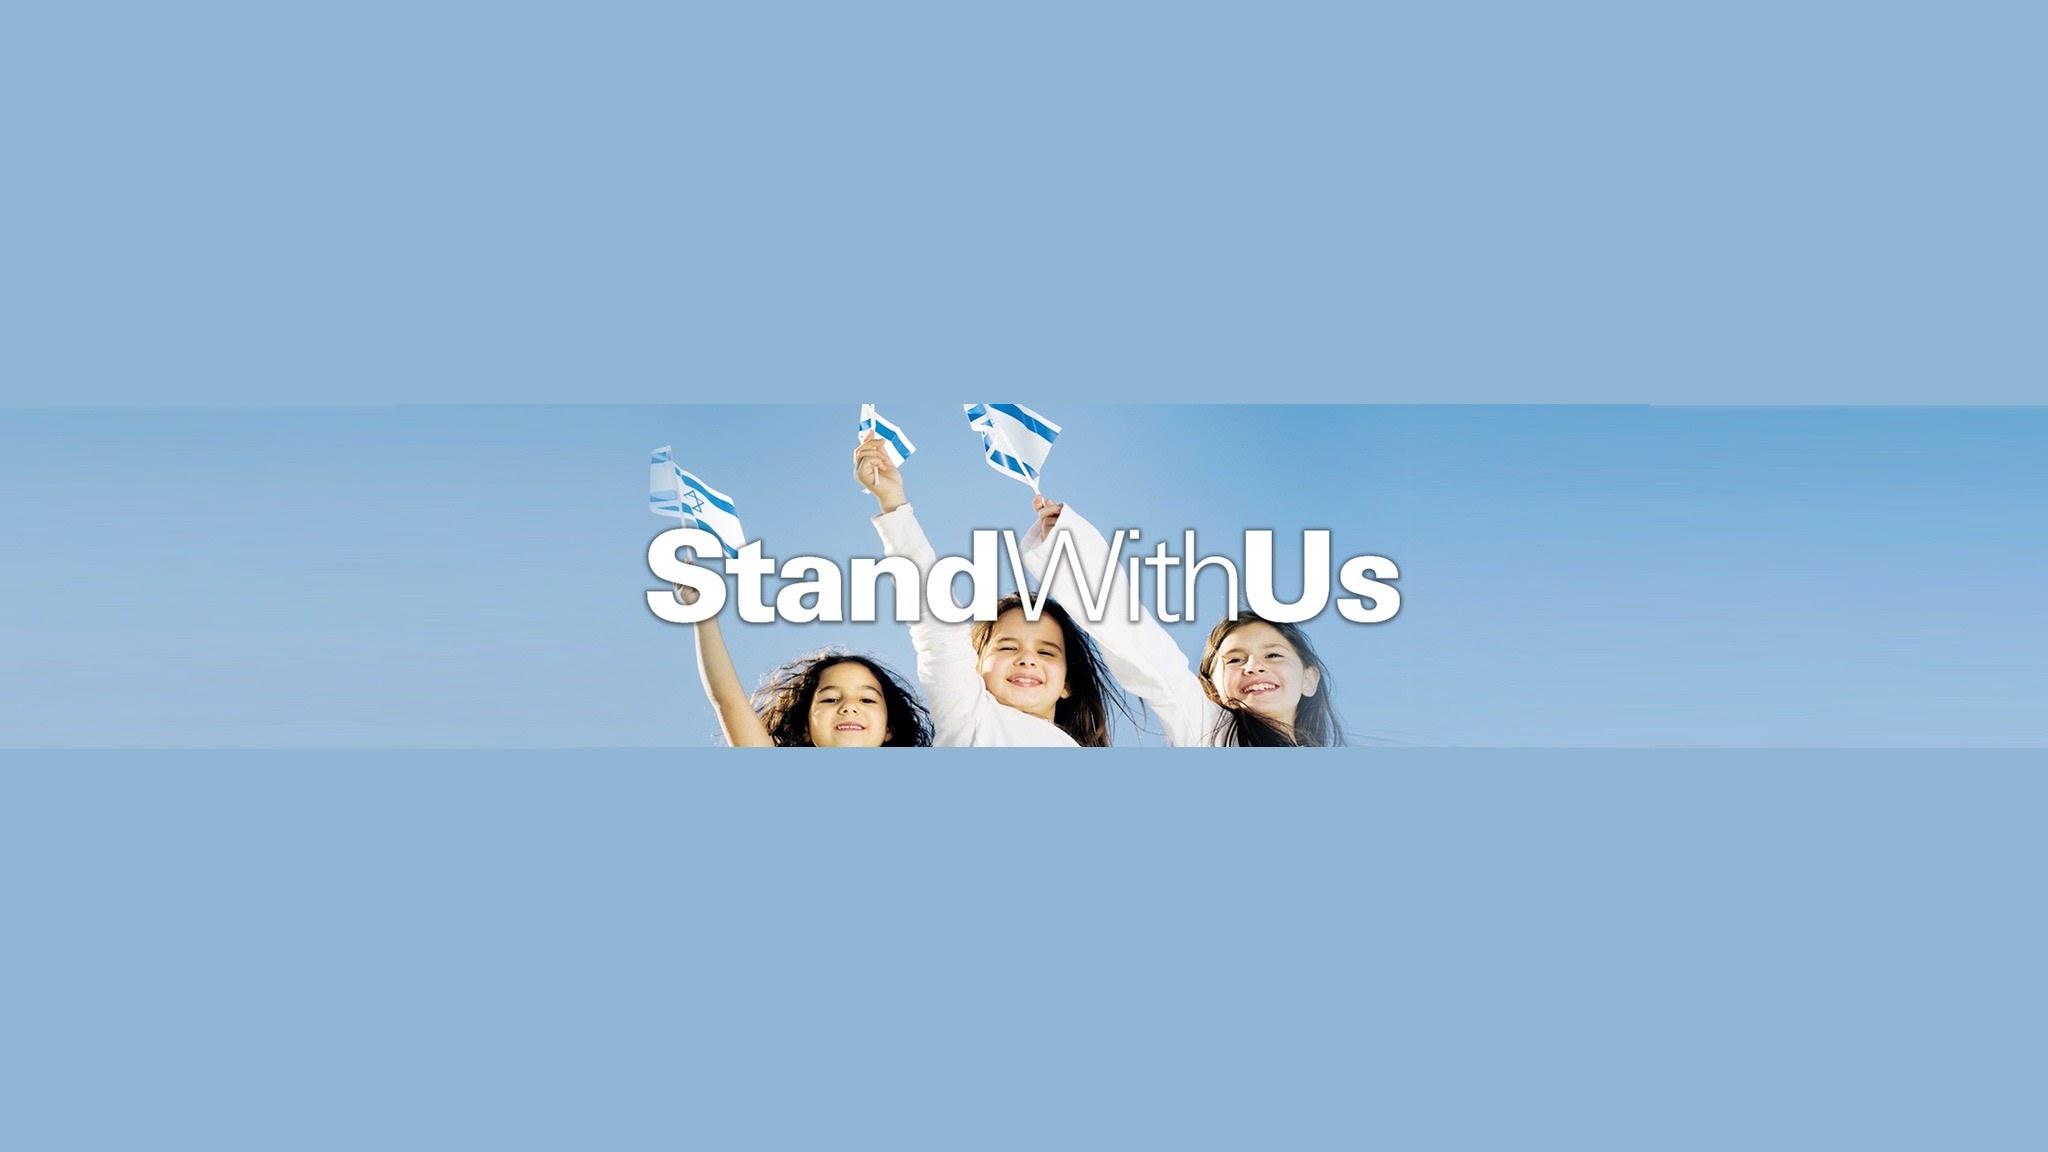 StandWithUs